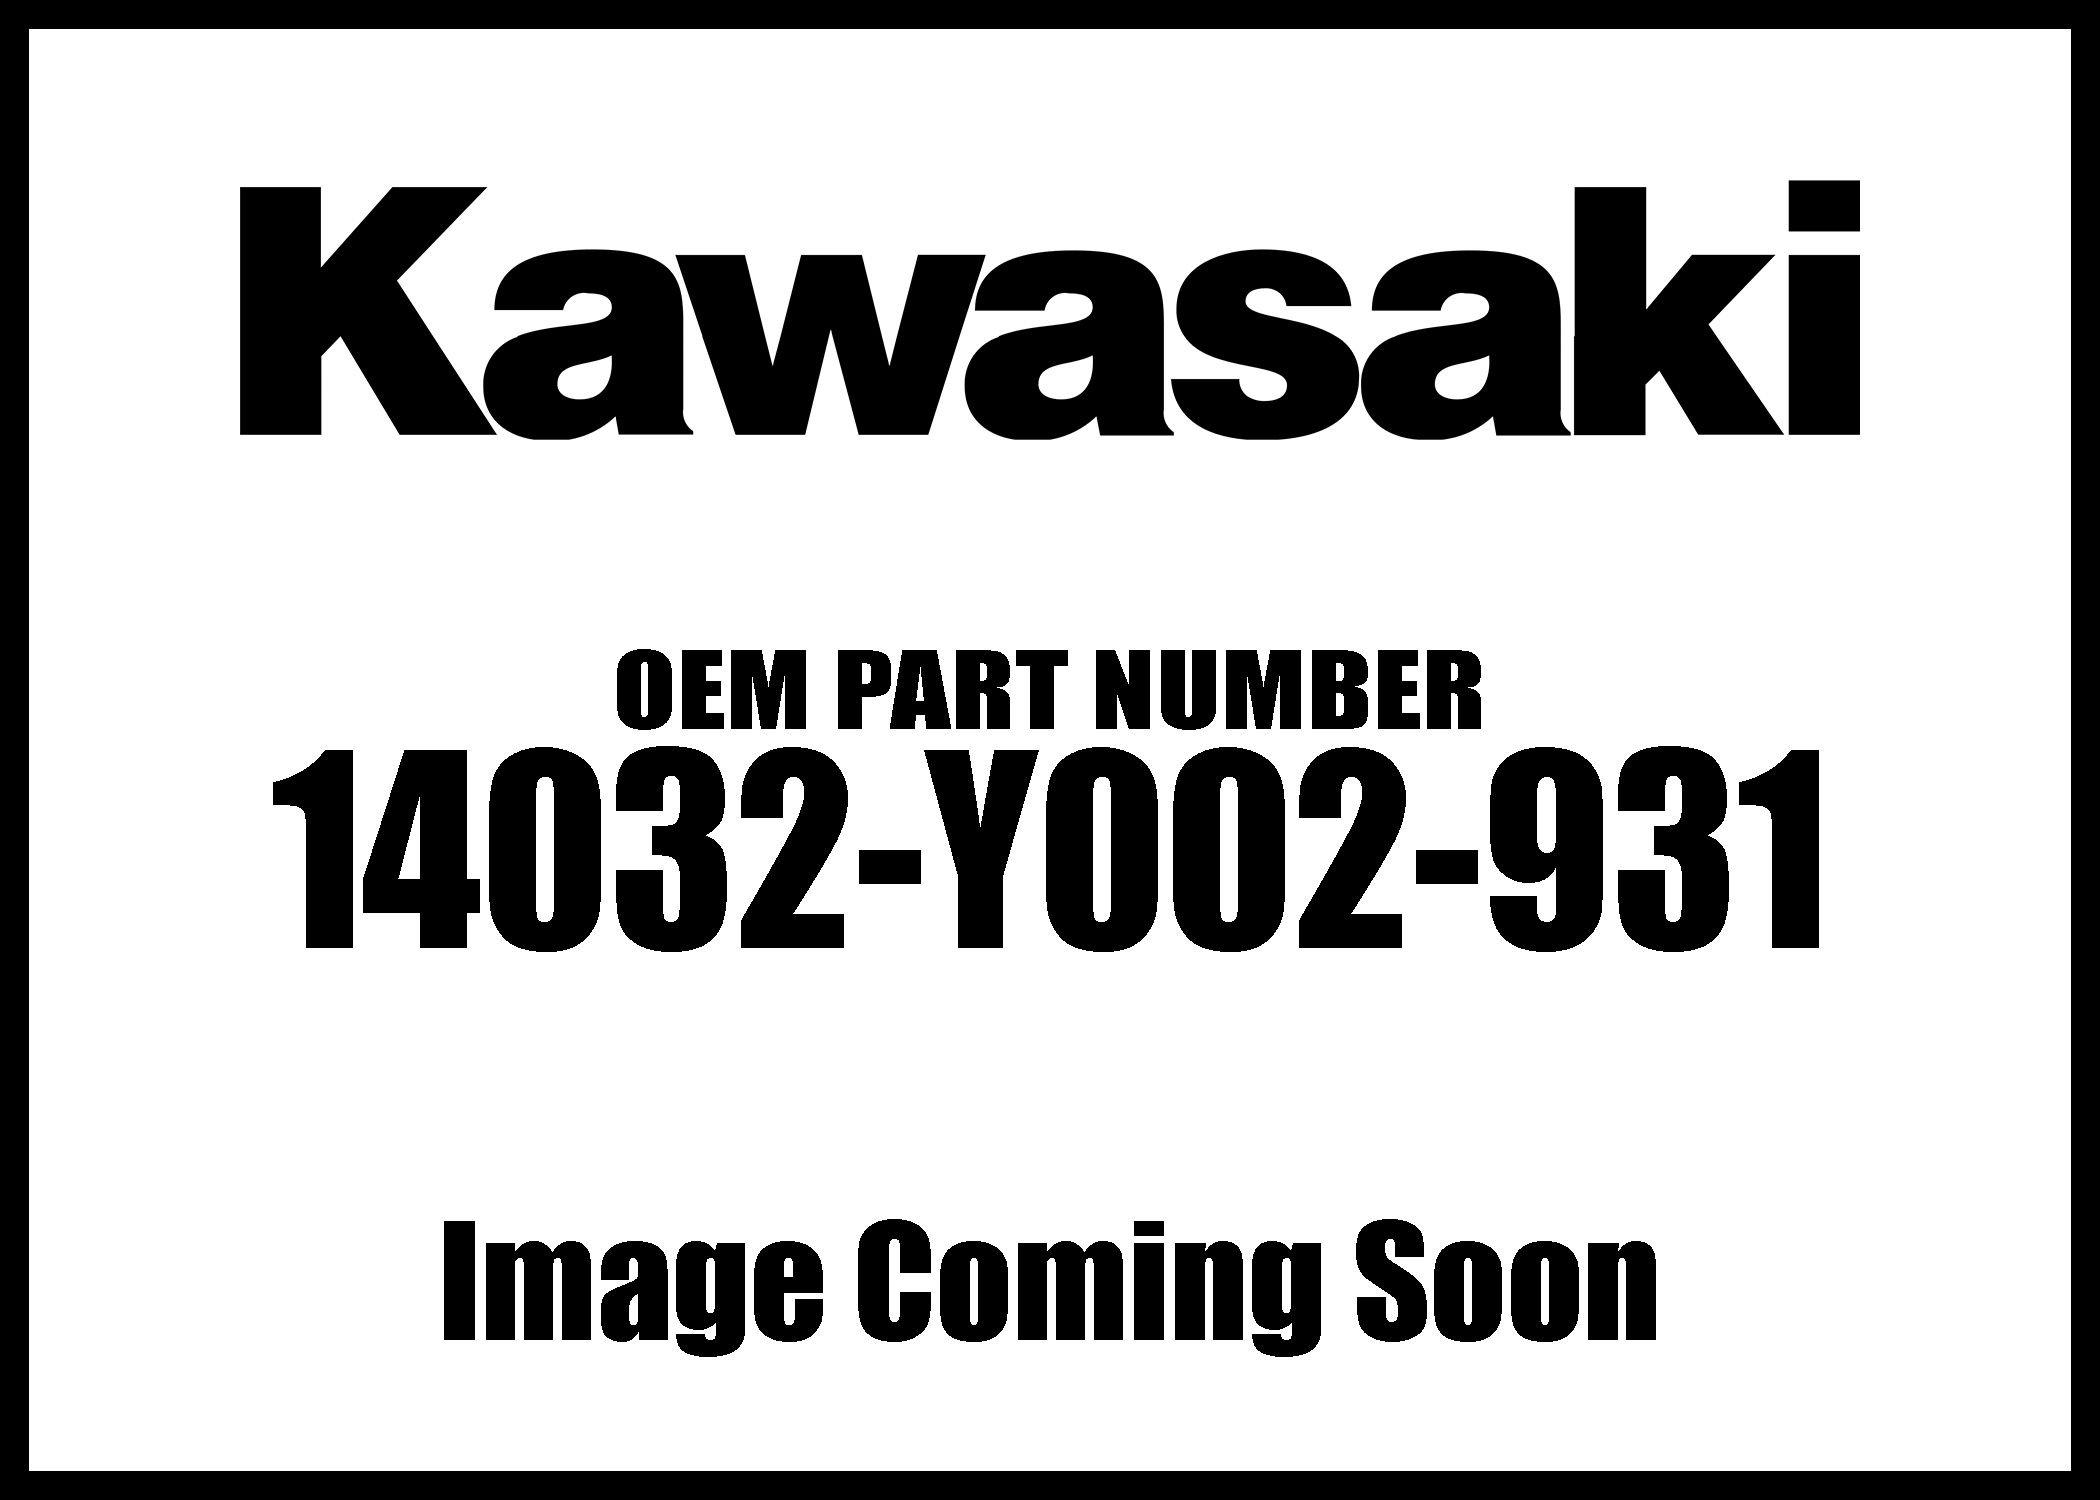 Kawasaki 07-17 KFX Cover Clutch Black 14032-Y002-931 New OEM